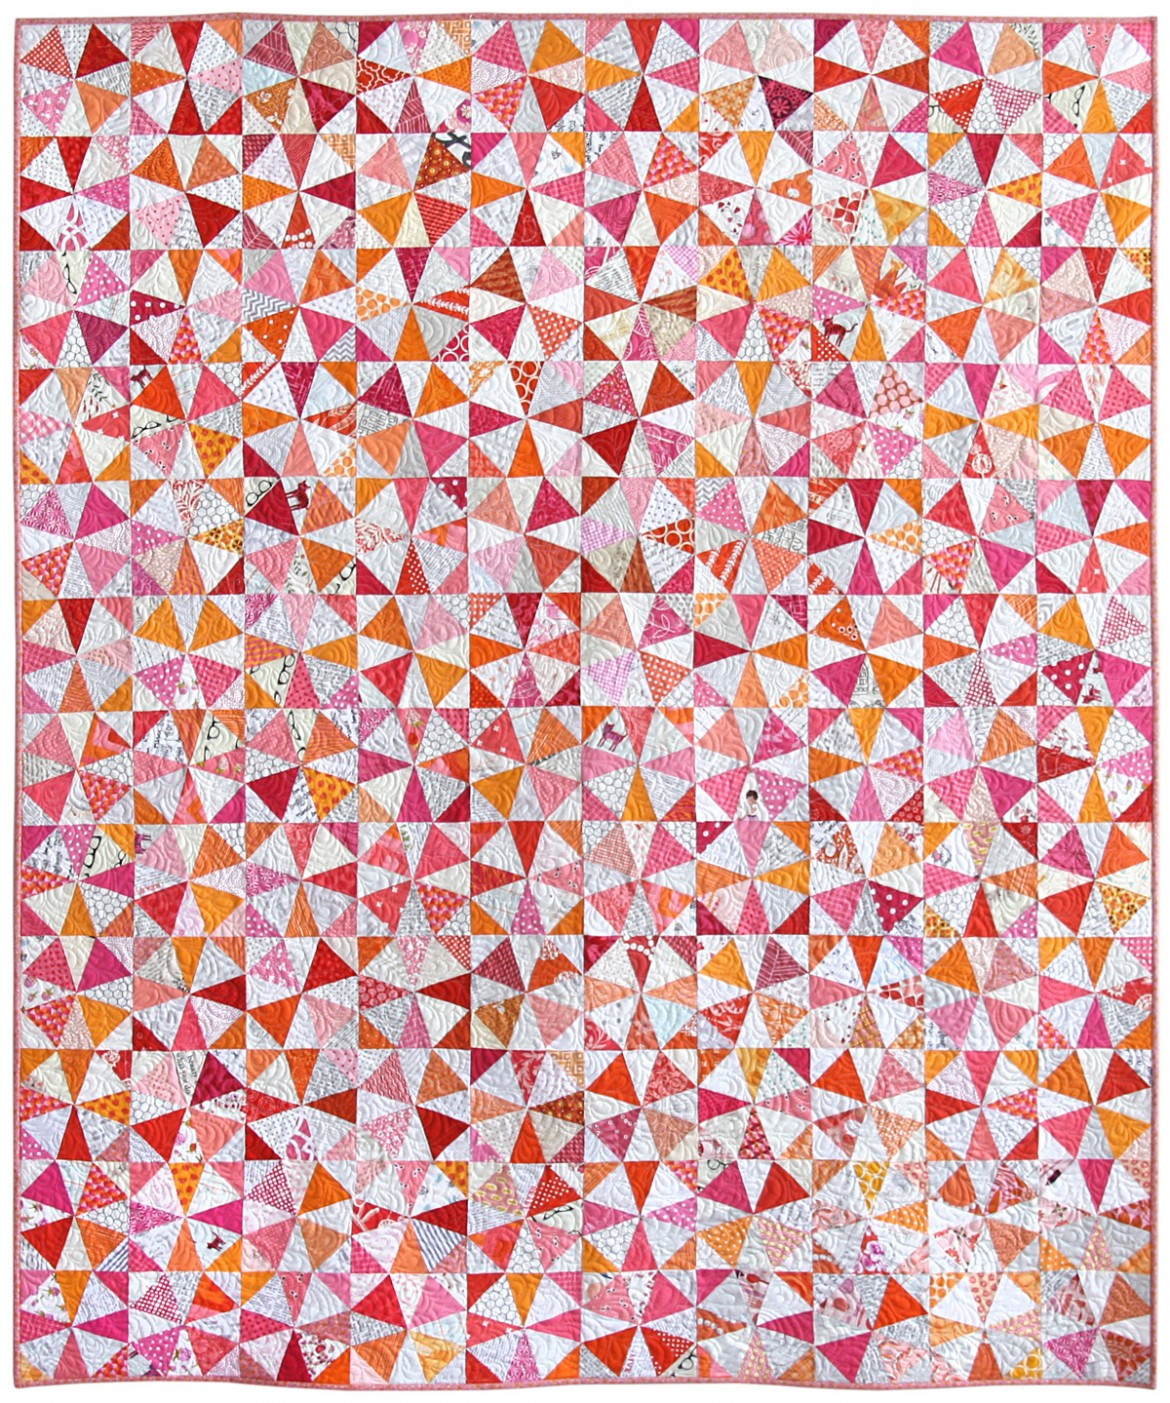 Kaleidoscope Modern Quilt by Nicole Neblett